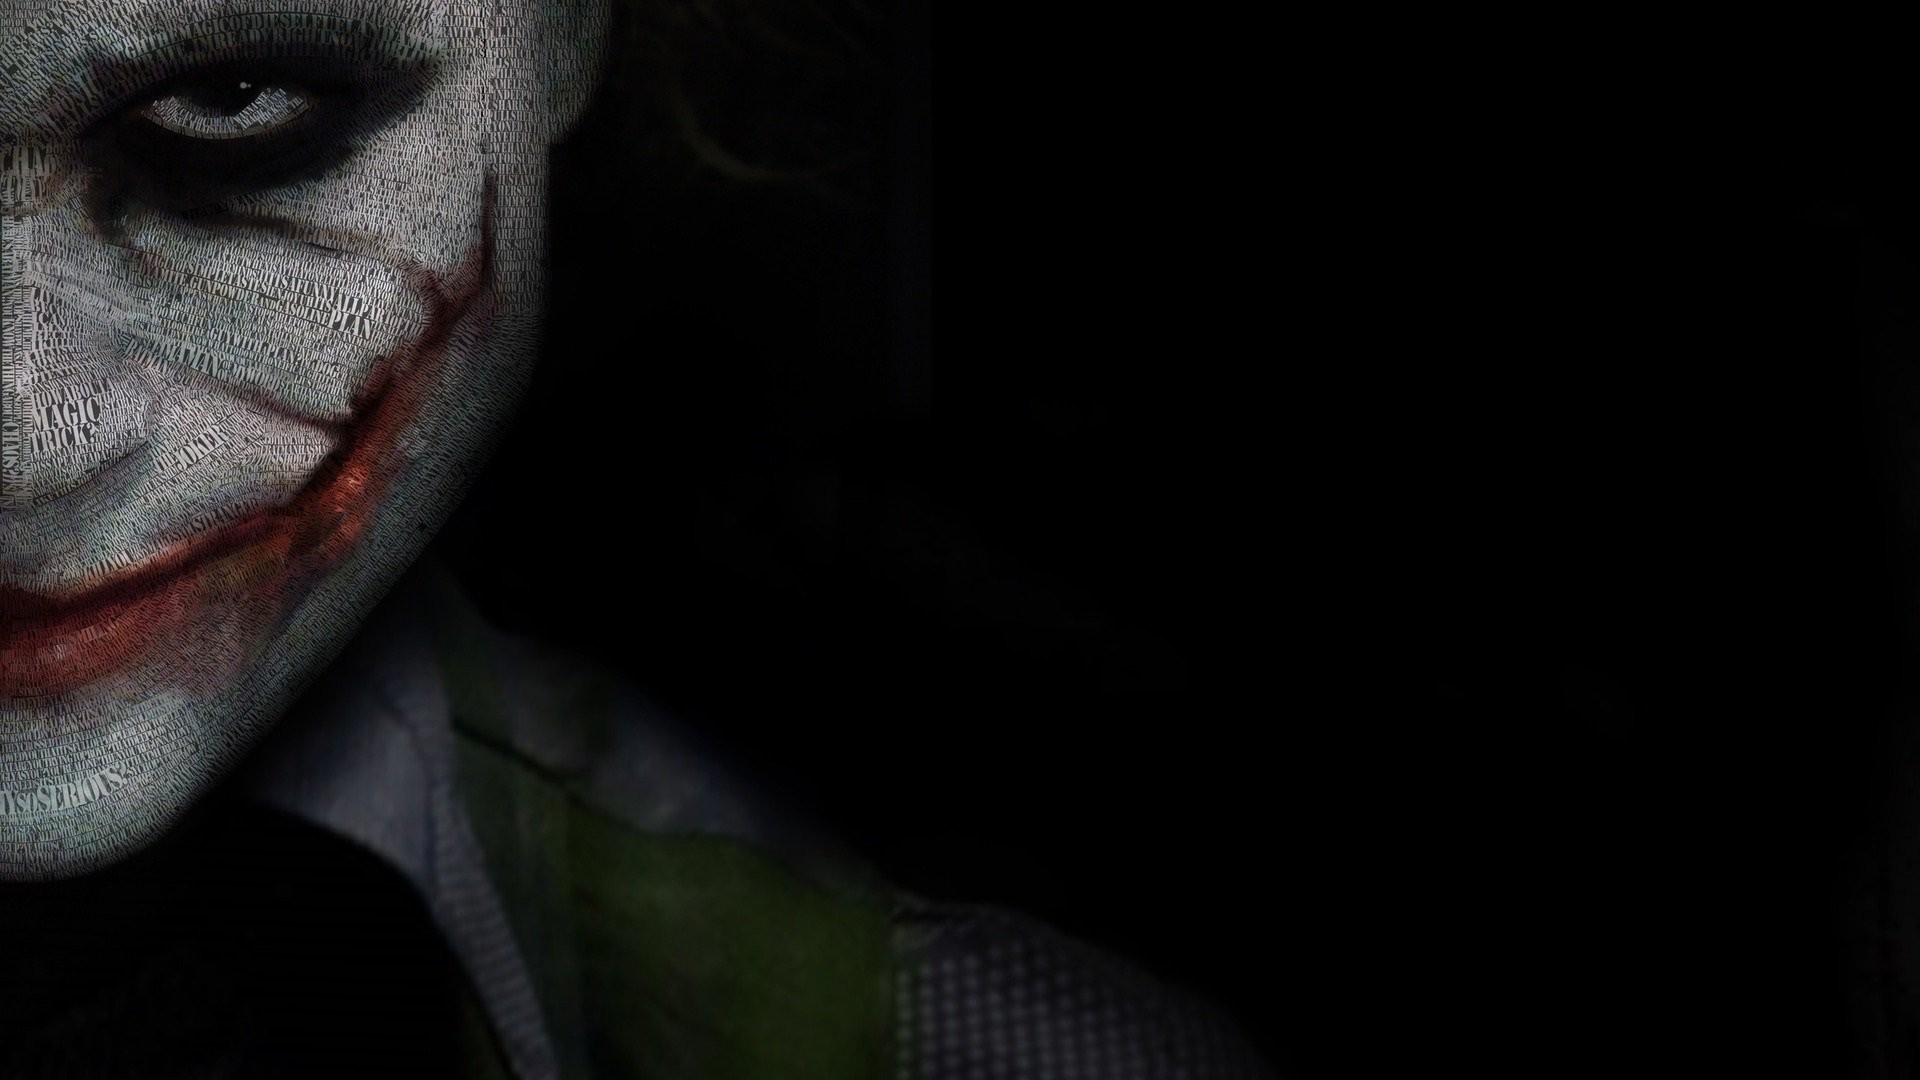 Wallpaper's – The Joker [Full-HD] 1080p – Taringa!